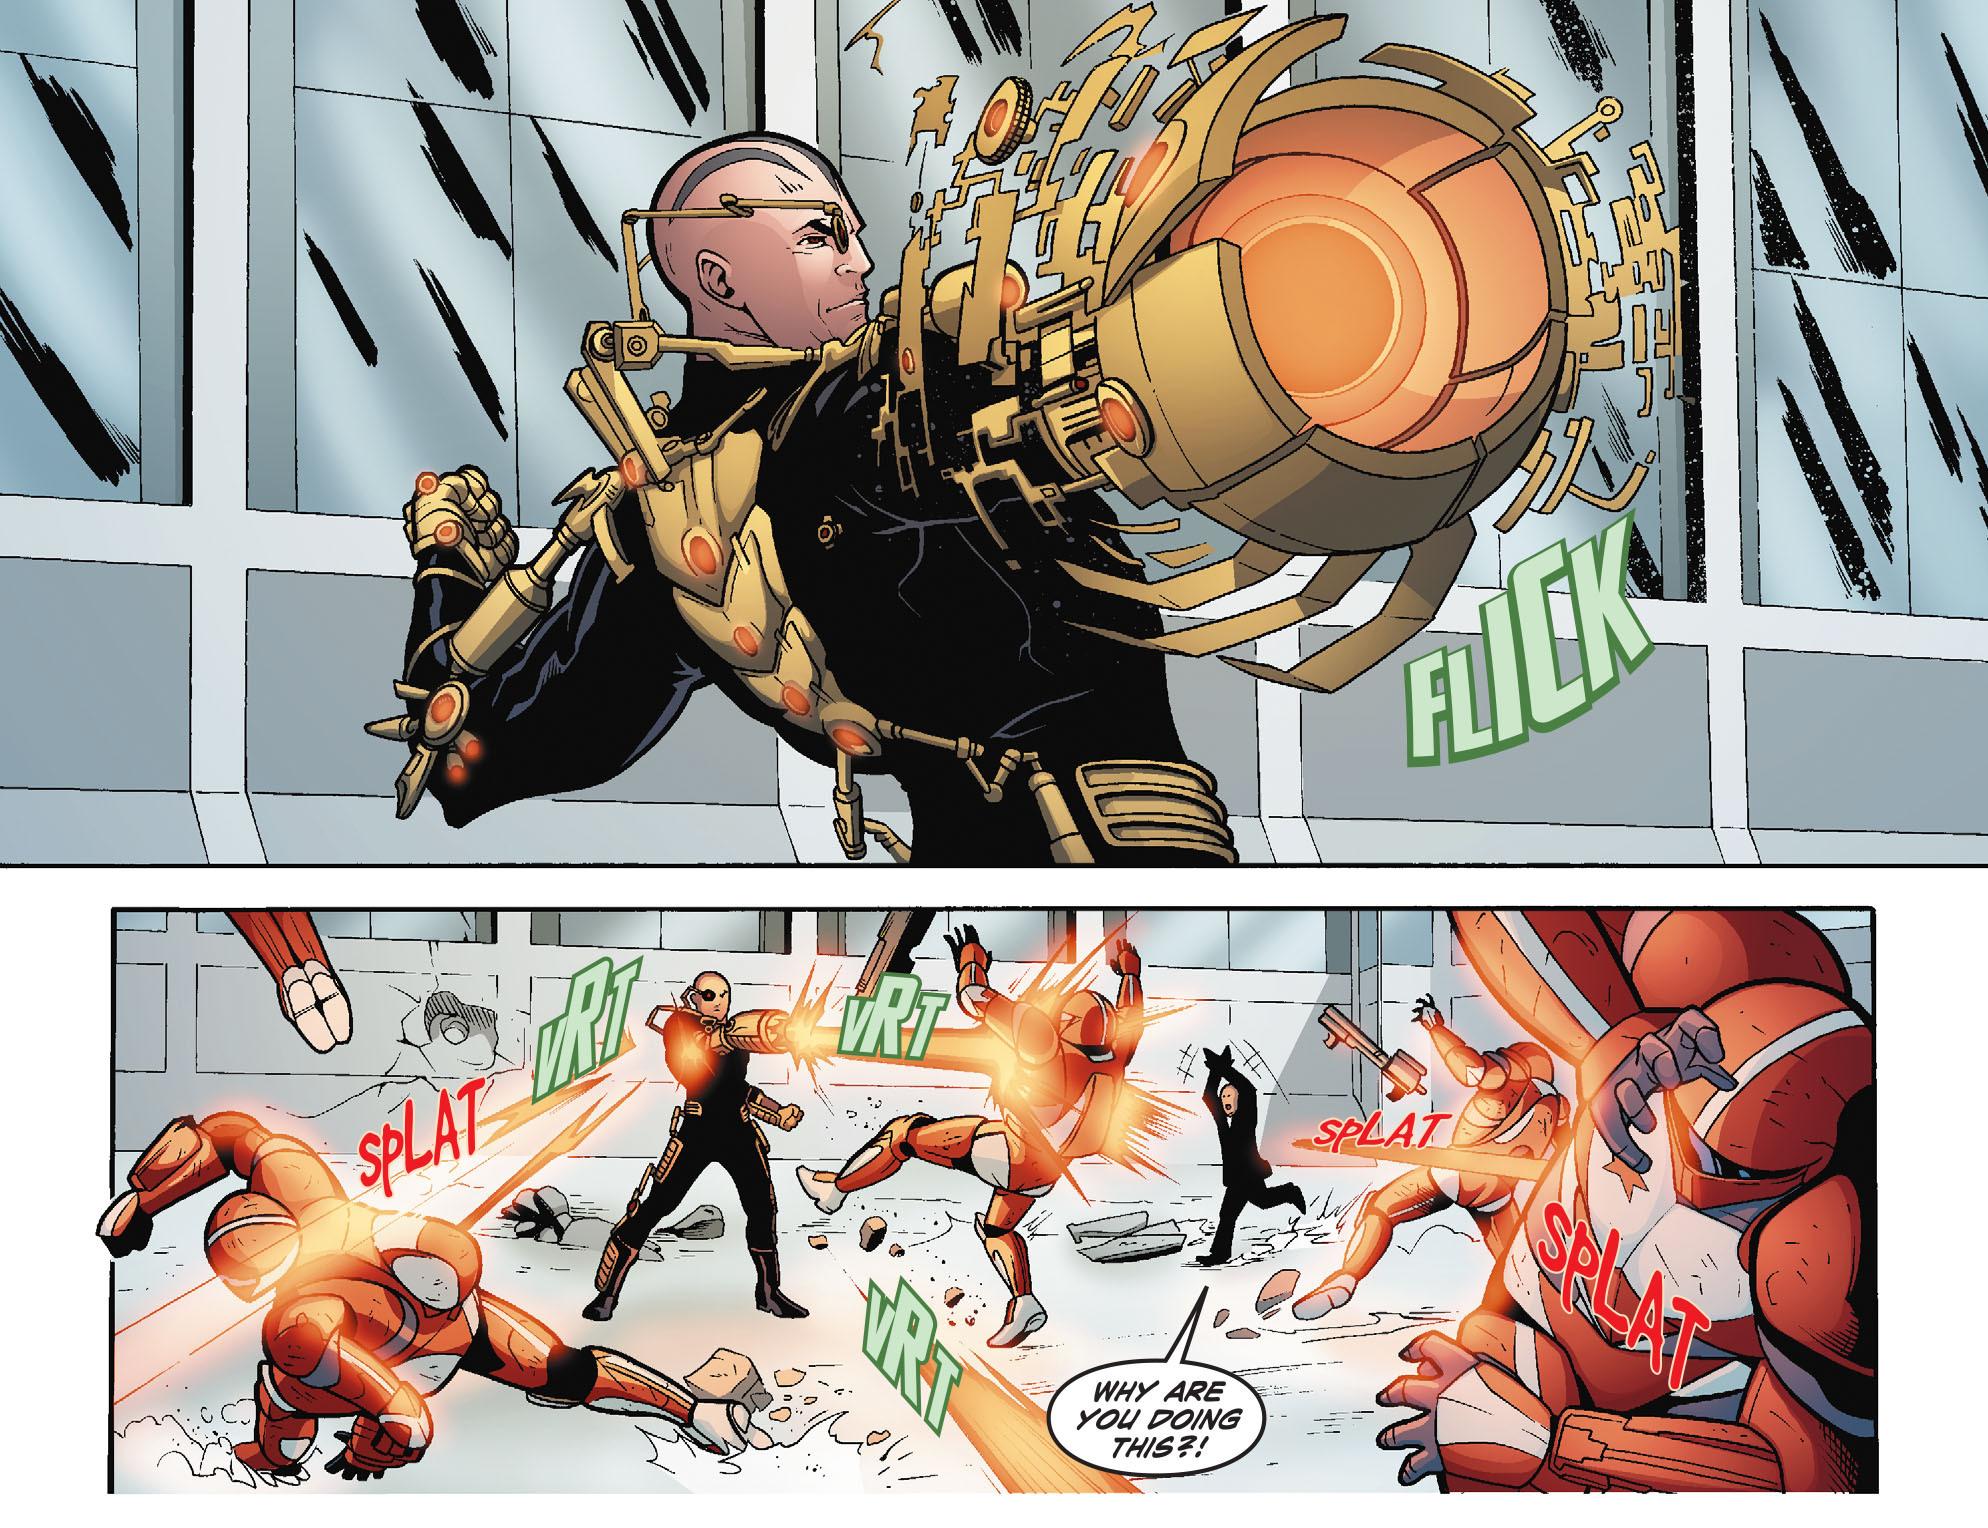 Read online Smallville: Alien comic -  Issue #6 - 15